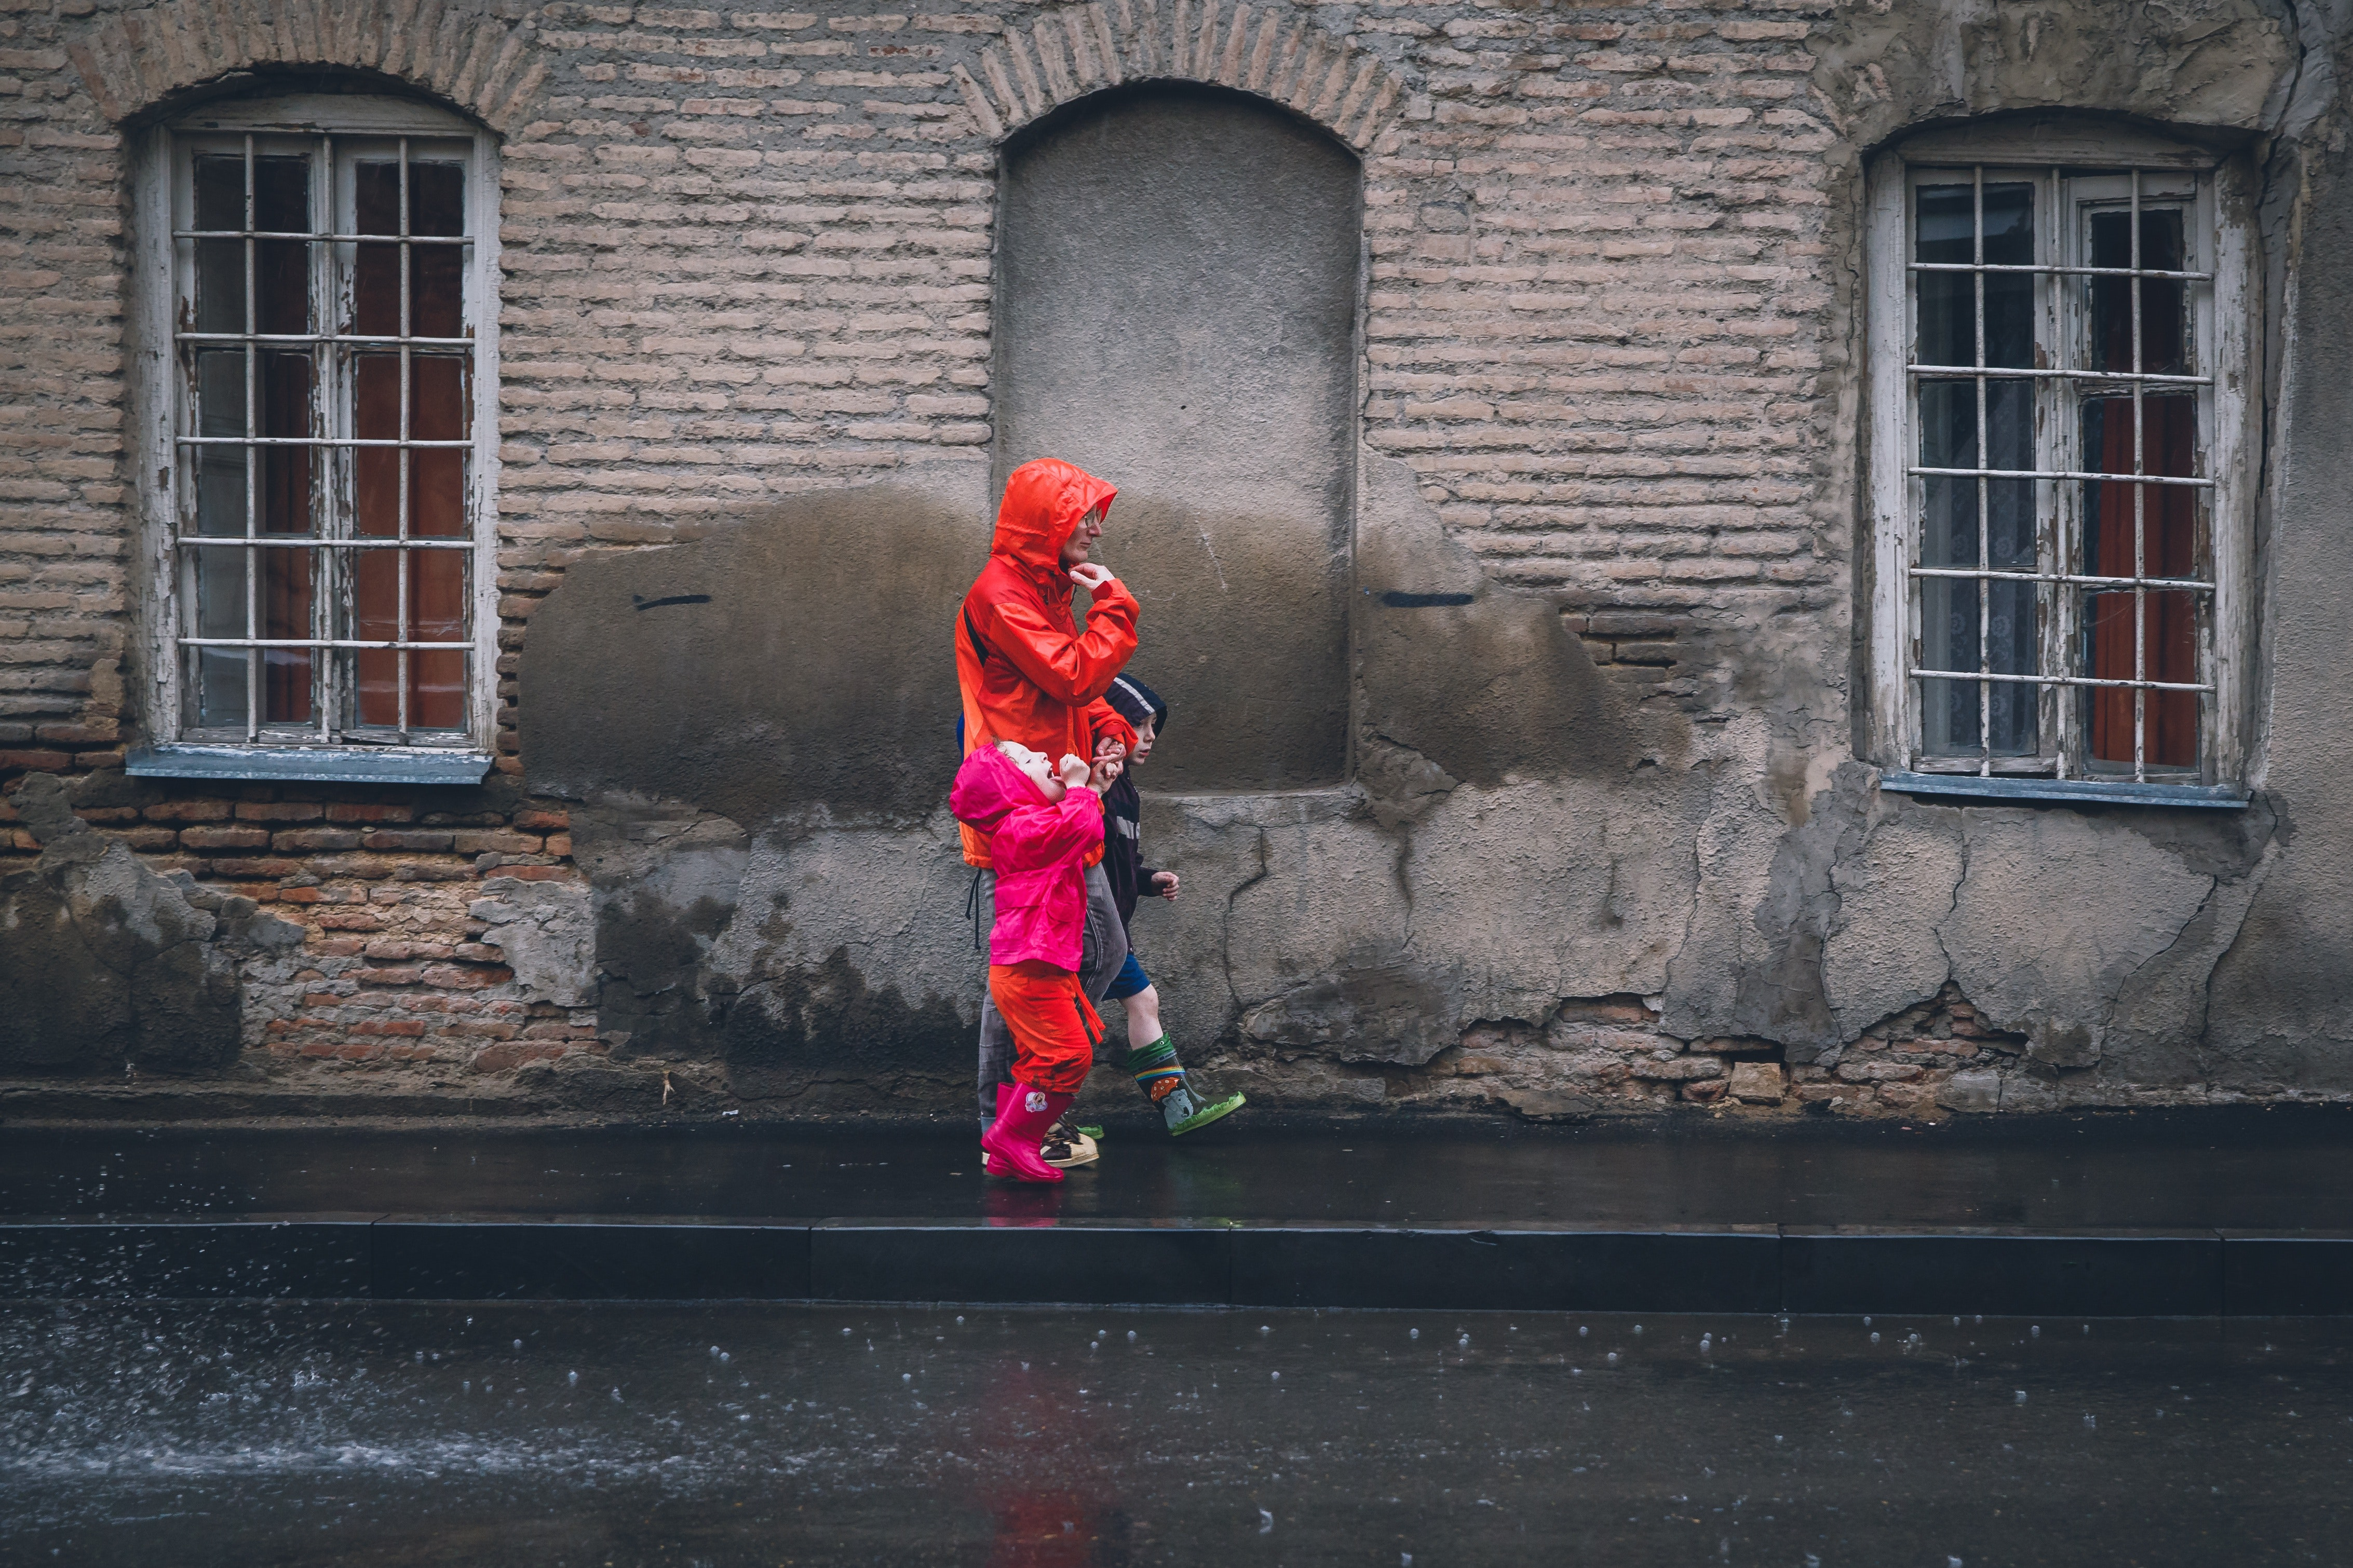 Children And Man Walking On A Sidewalk During Daytime Raincoat Street Wall